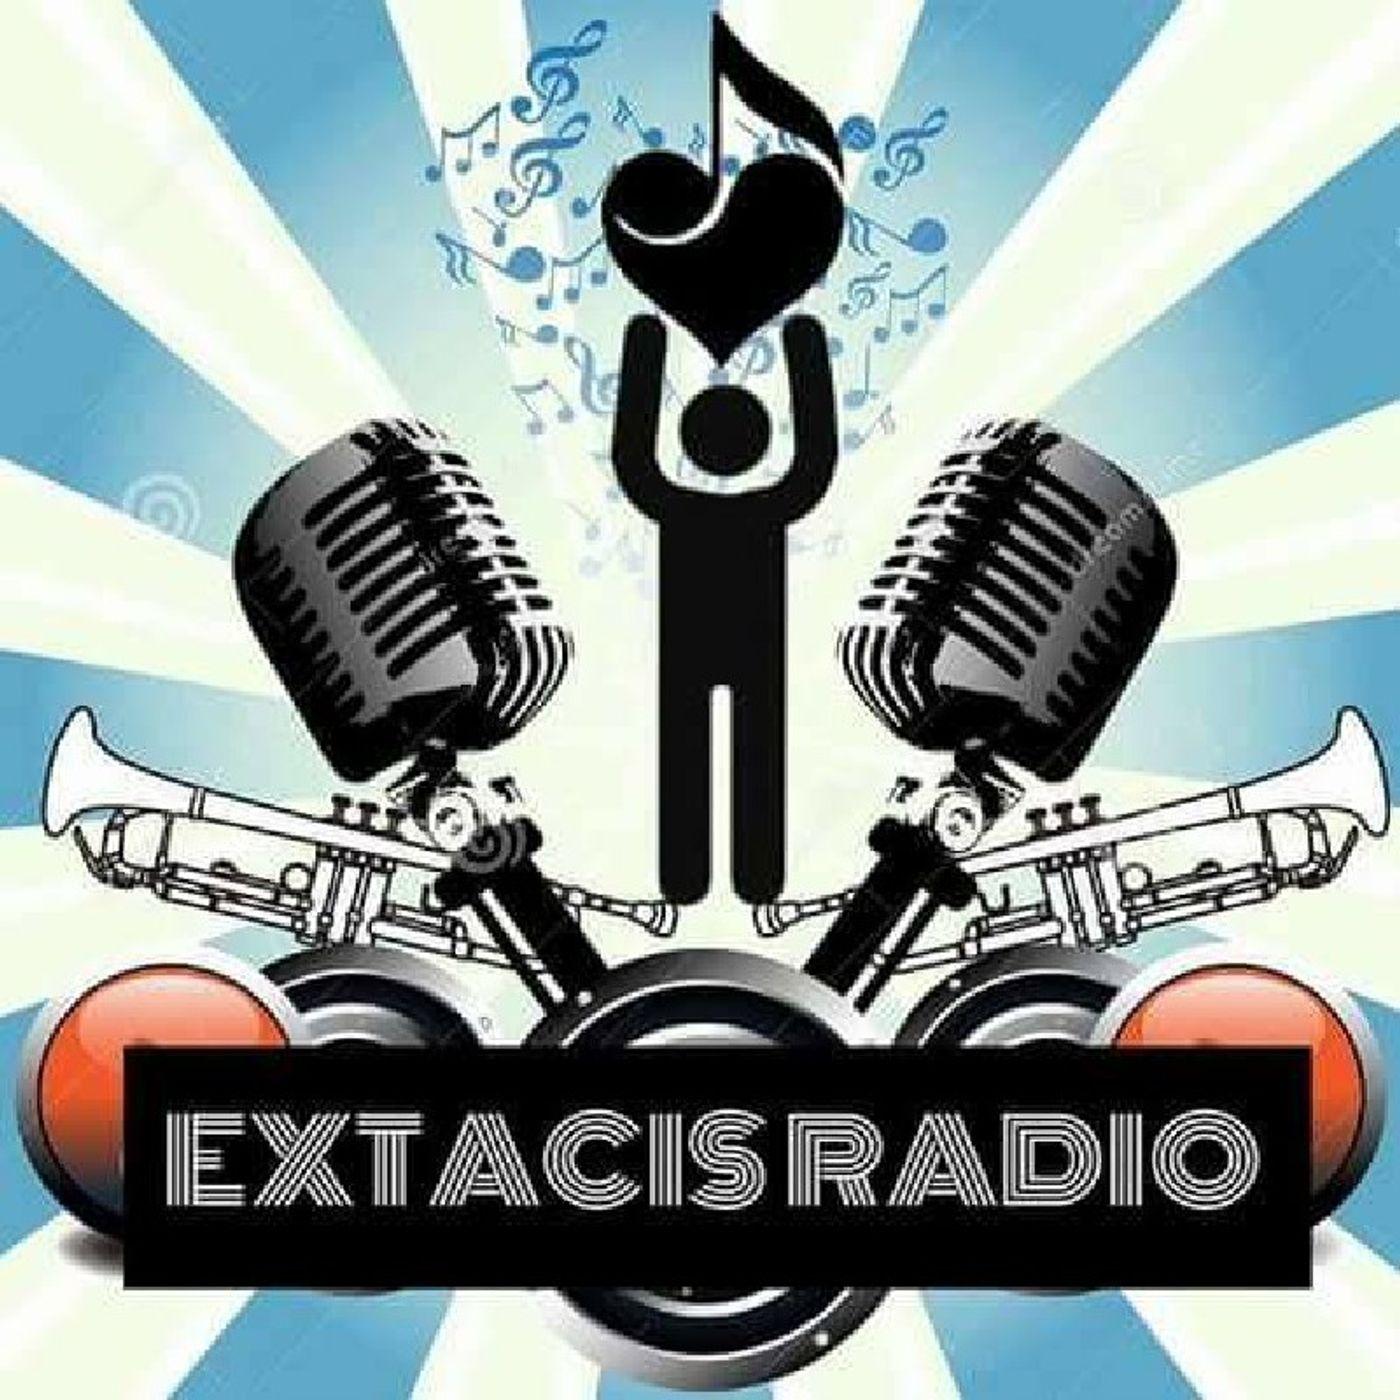 Extacis radio México /By Atlanta Group.